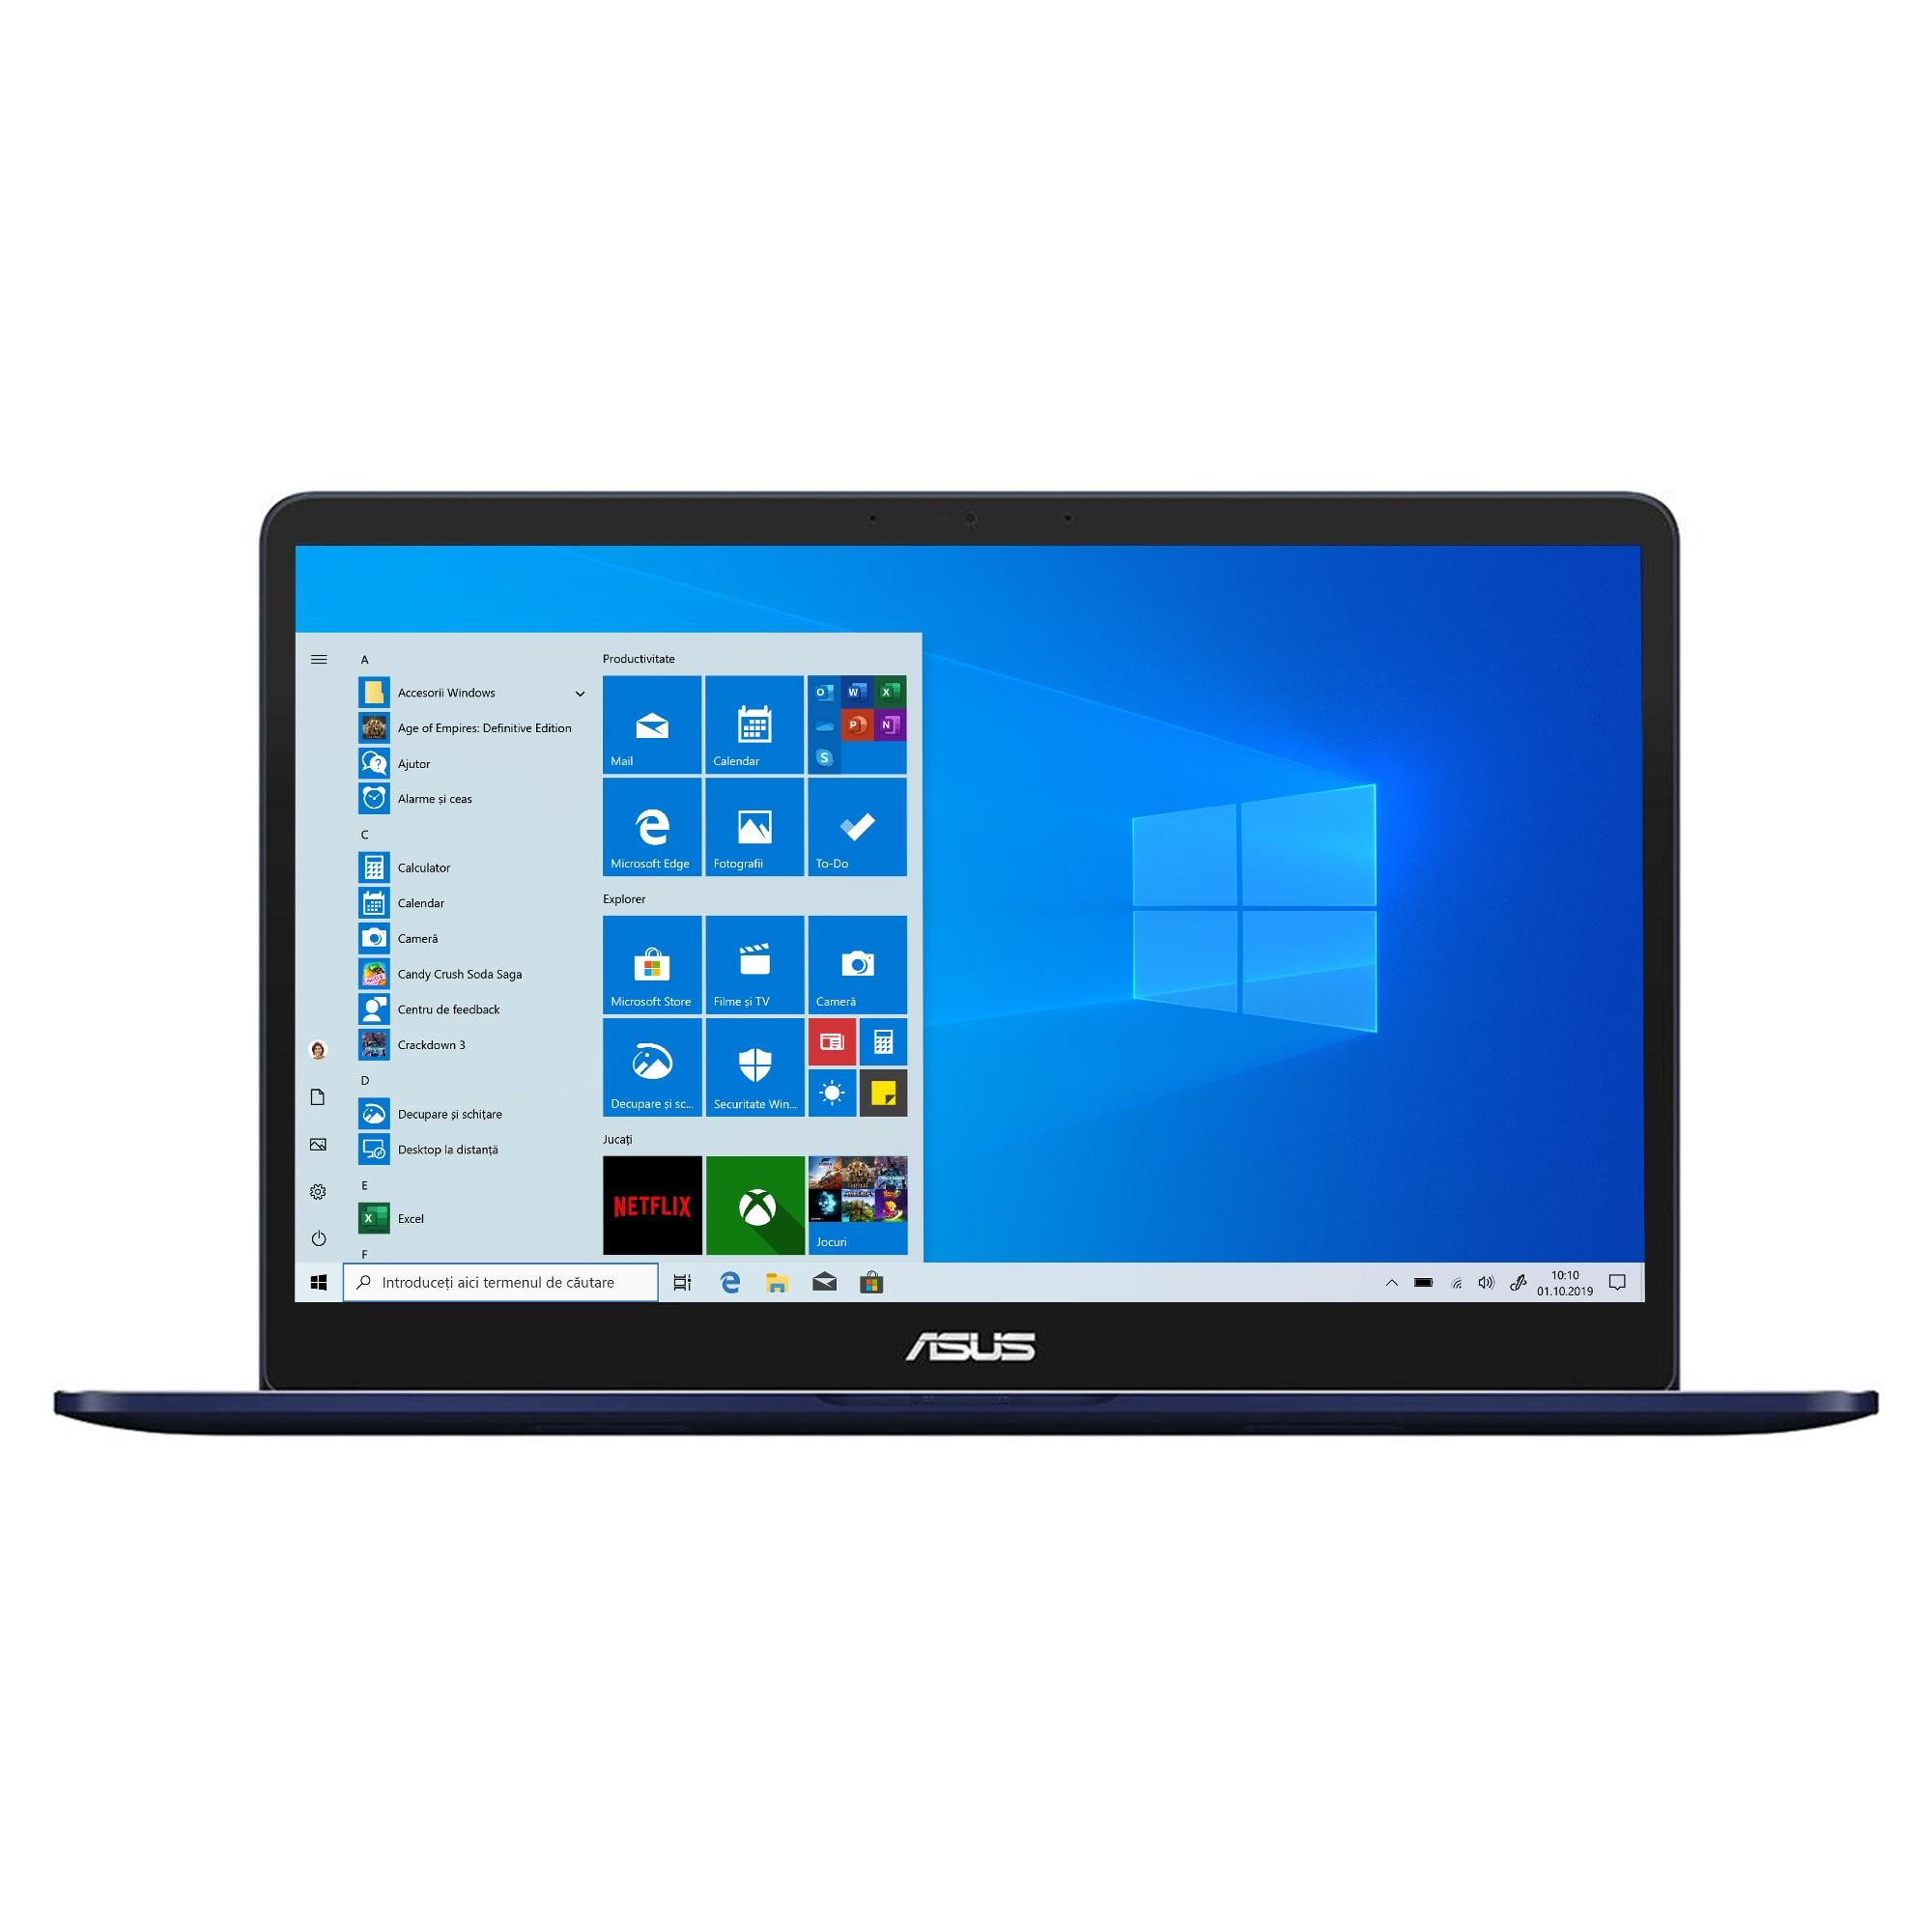 "Fotografie Laptop ASUS ZenBook Pro 15 UX550GE cu procesor Intel® Core™ i7-8750H pana la 4.10 GHz, Coffee Lake, 15.6"", Full HD, 16GB, 512GB SSD, nVIDIA® GeForce® GTX 1050 Ti 4GB, Microsoft Windows 10 Pro, Blue"